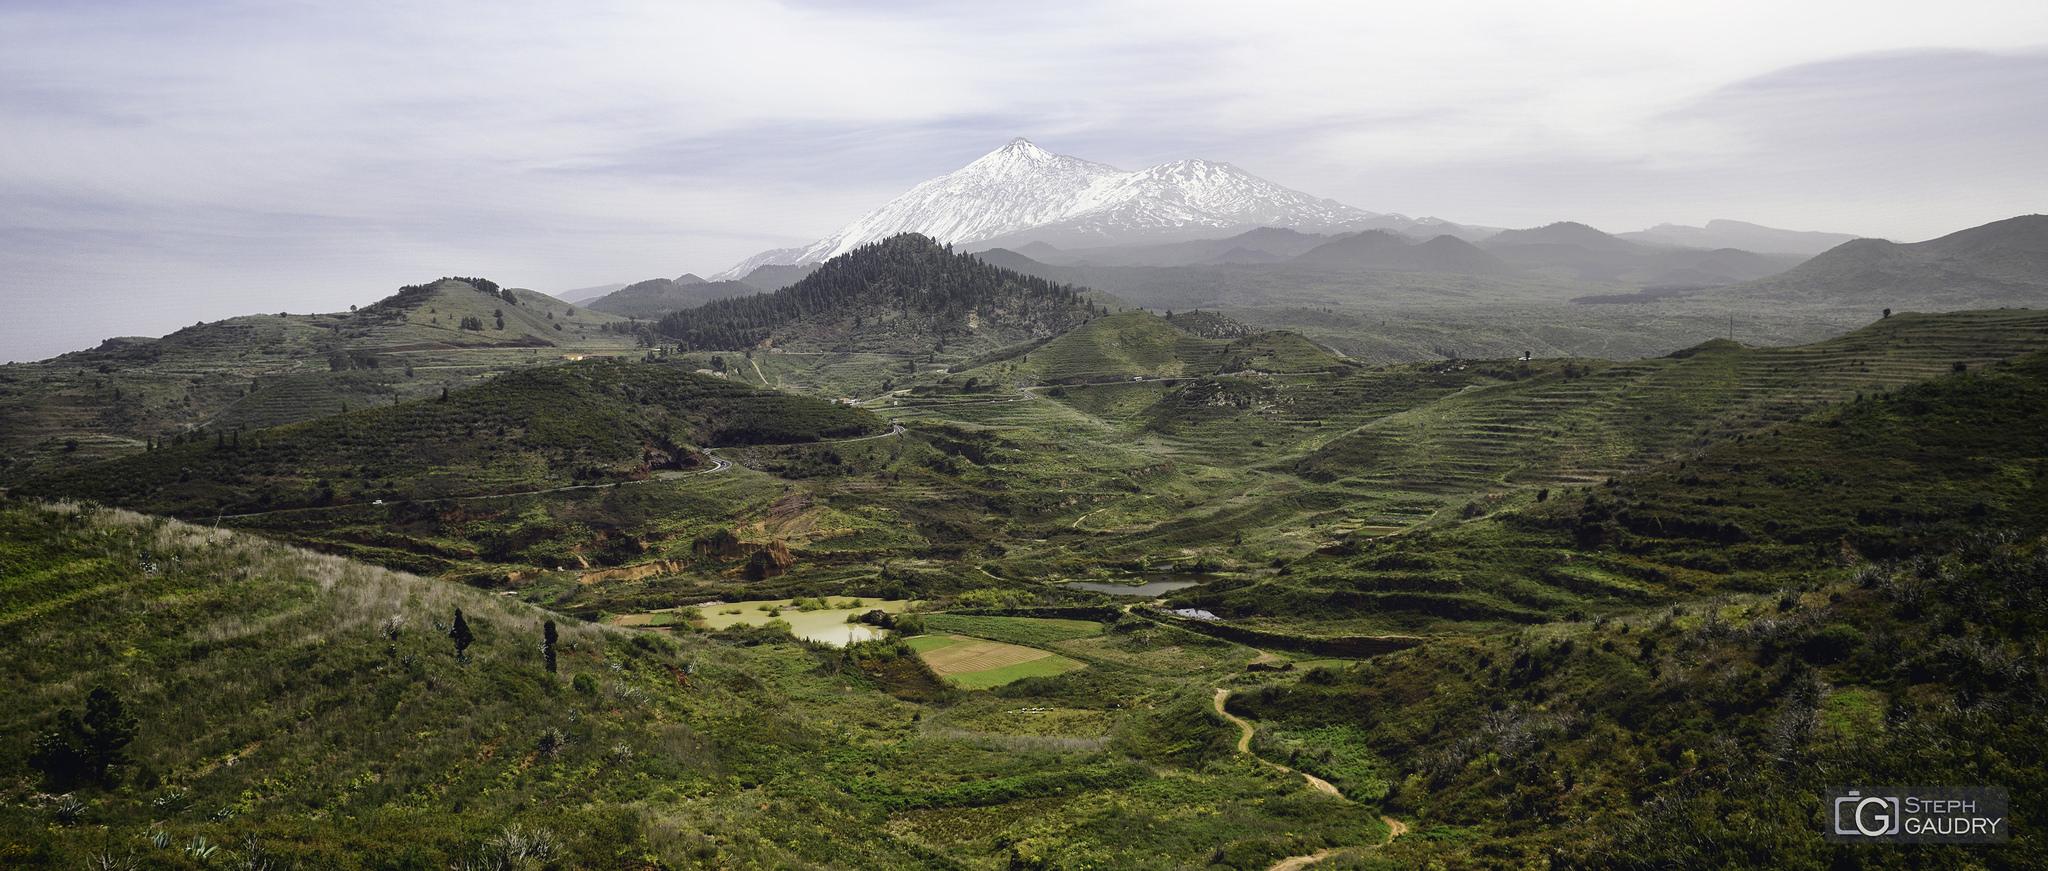 Pico del Teide - Charcas De Erjos [Klik om de diavoorstelling te starten]